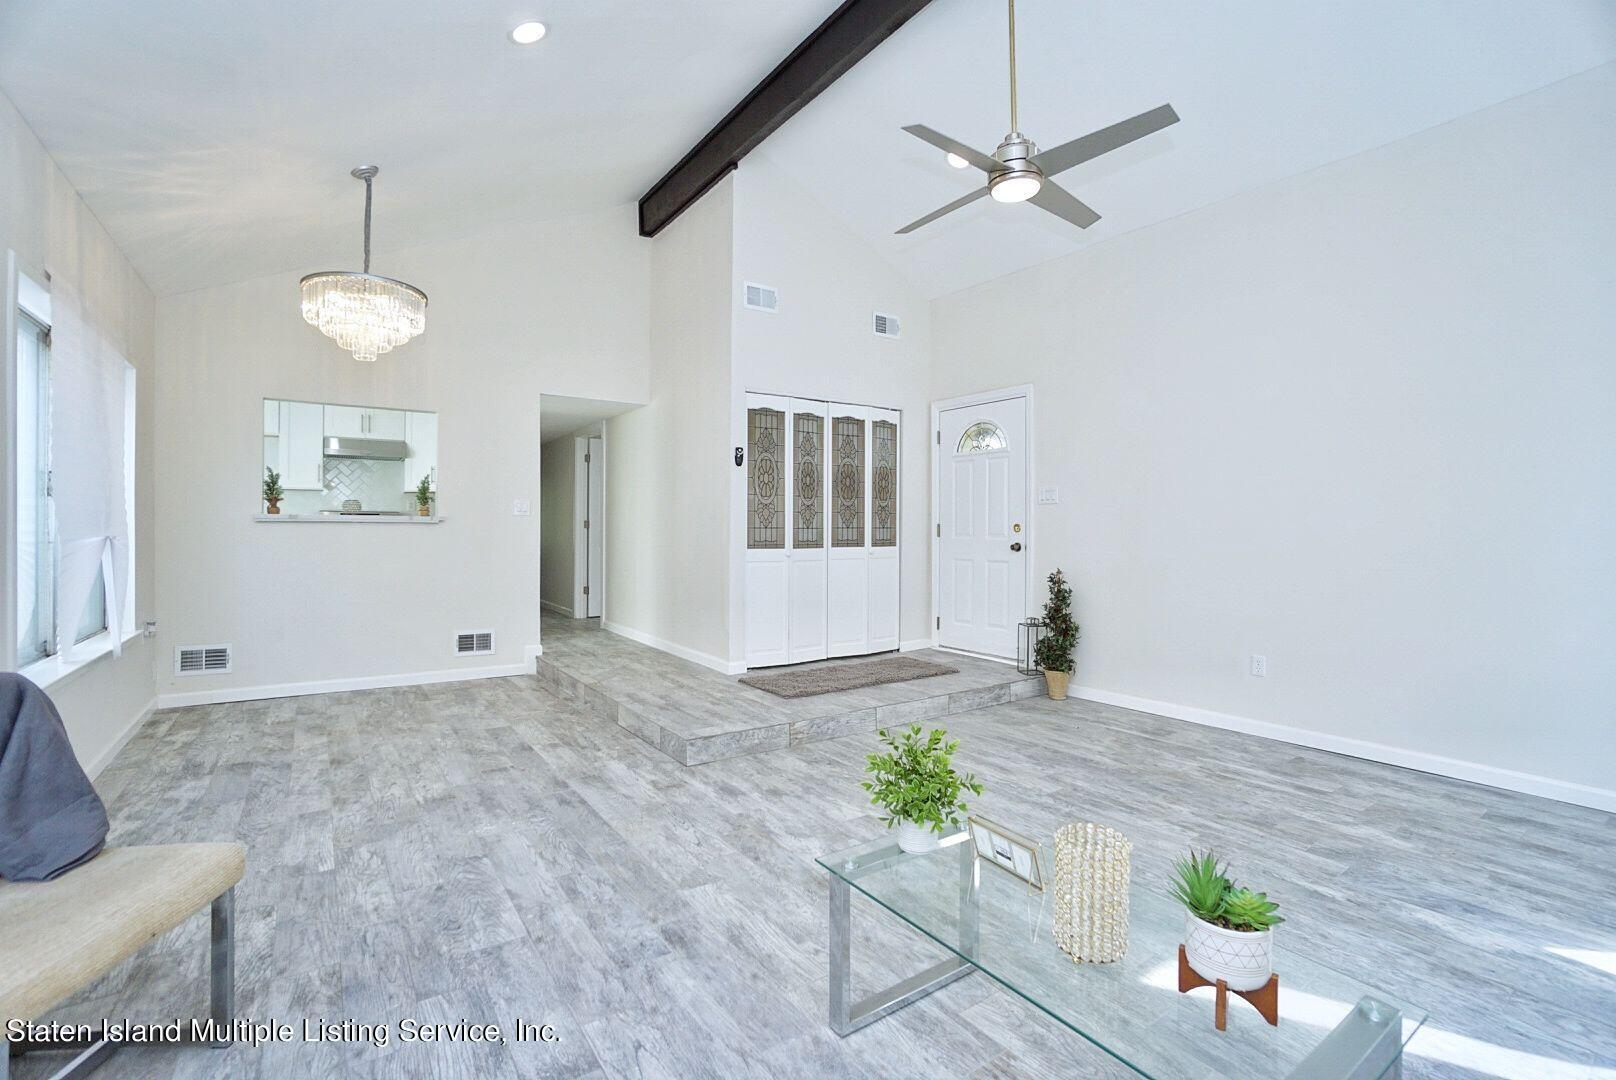 Single Family - Detached 83 Boylan Street  Staten Island, NY 10312, MLS-1149266-5